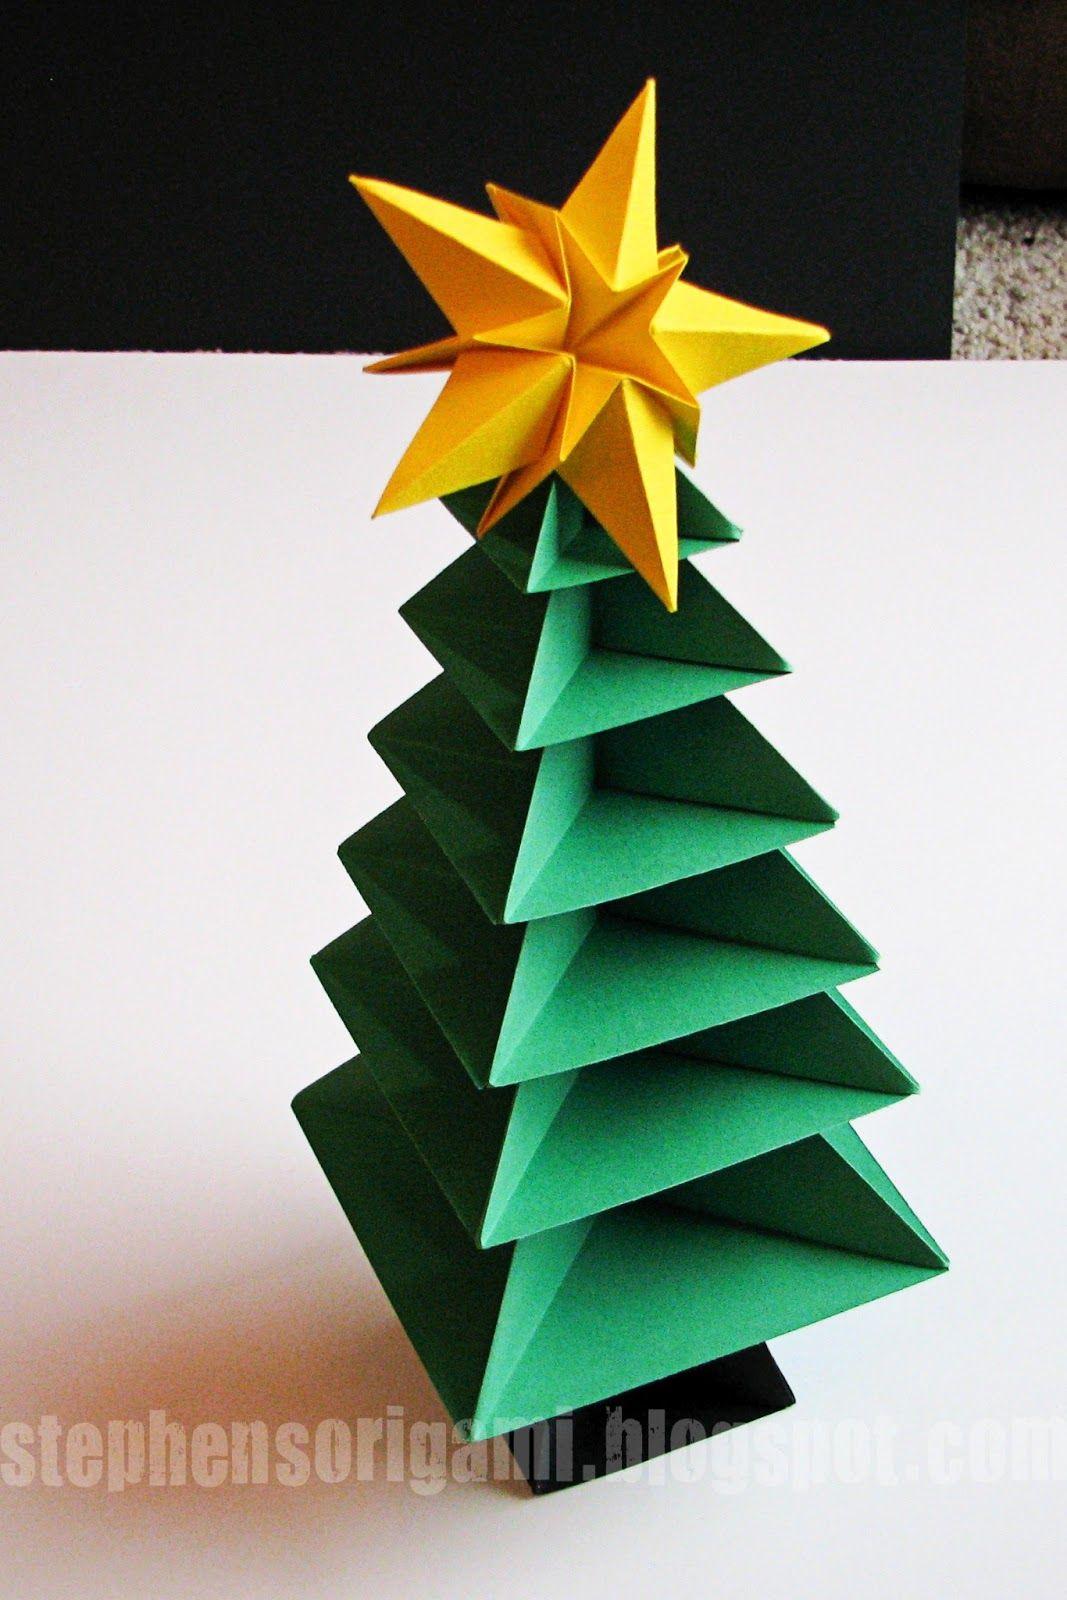 Stephen S Origami Origami Christmas Tree Tutorial Origami Christmas Tree Christmas Origami Paper Christmas Decorations